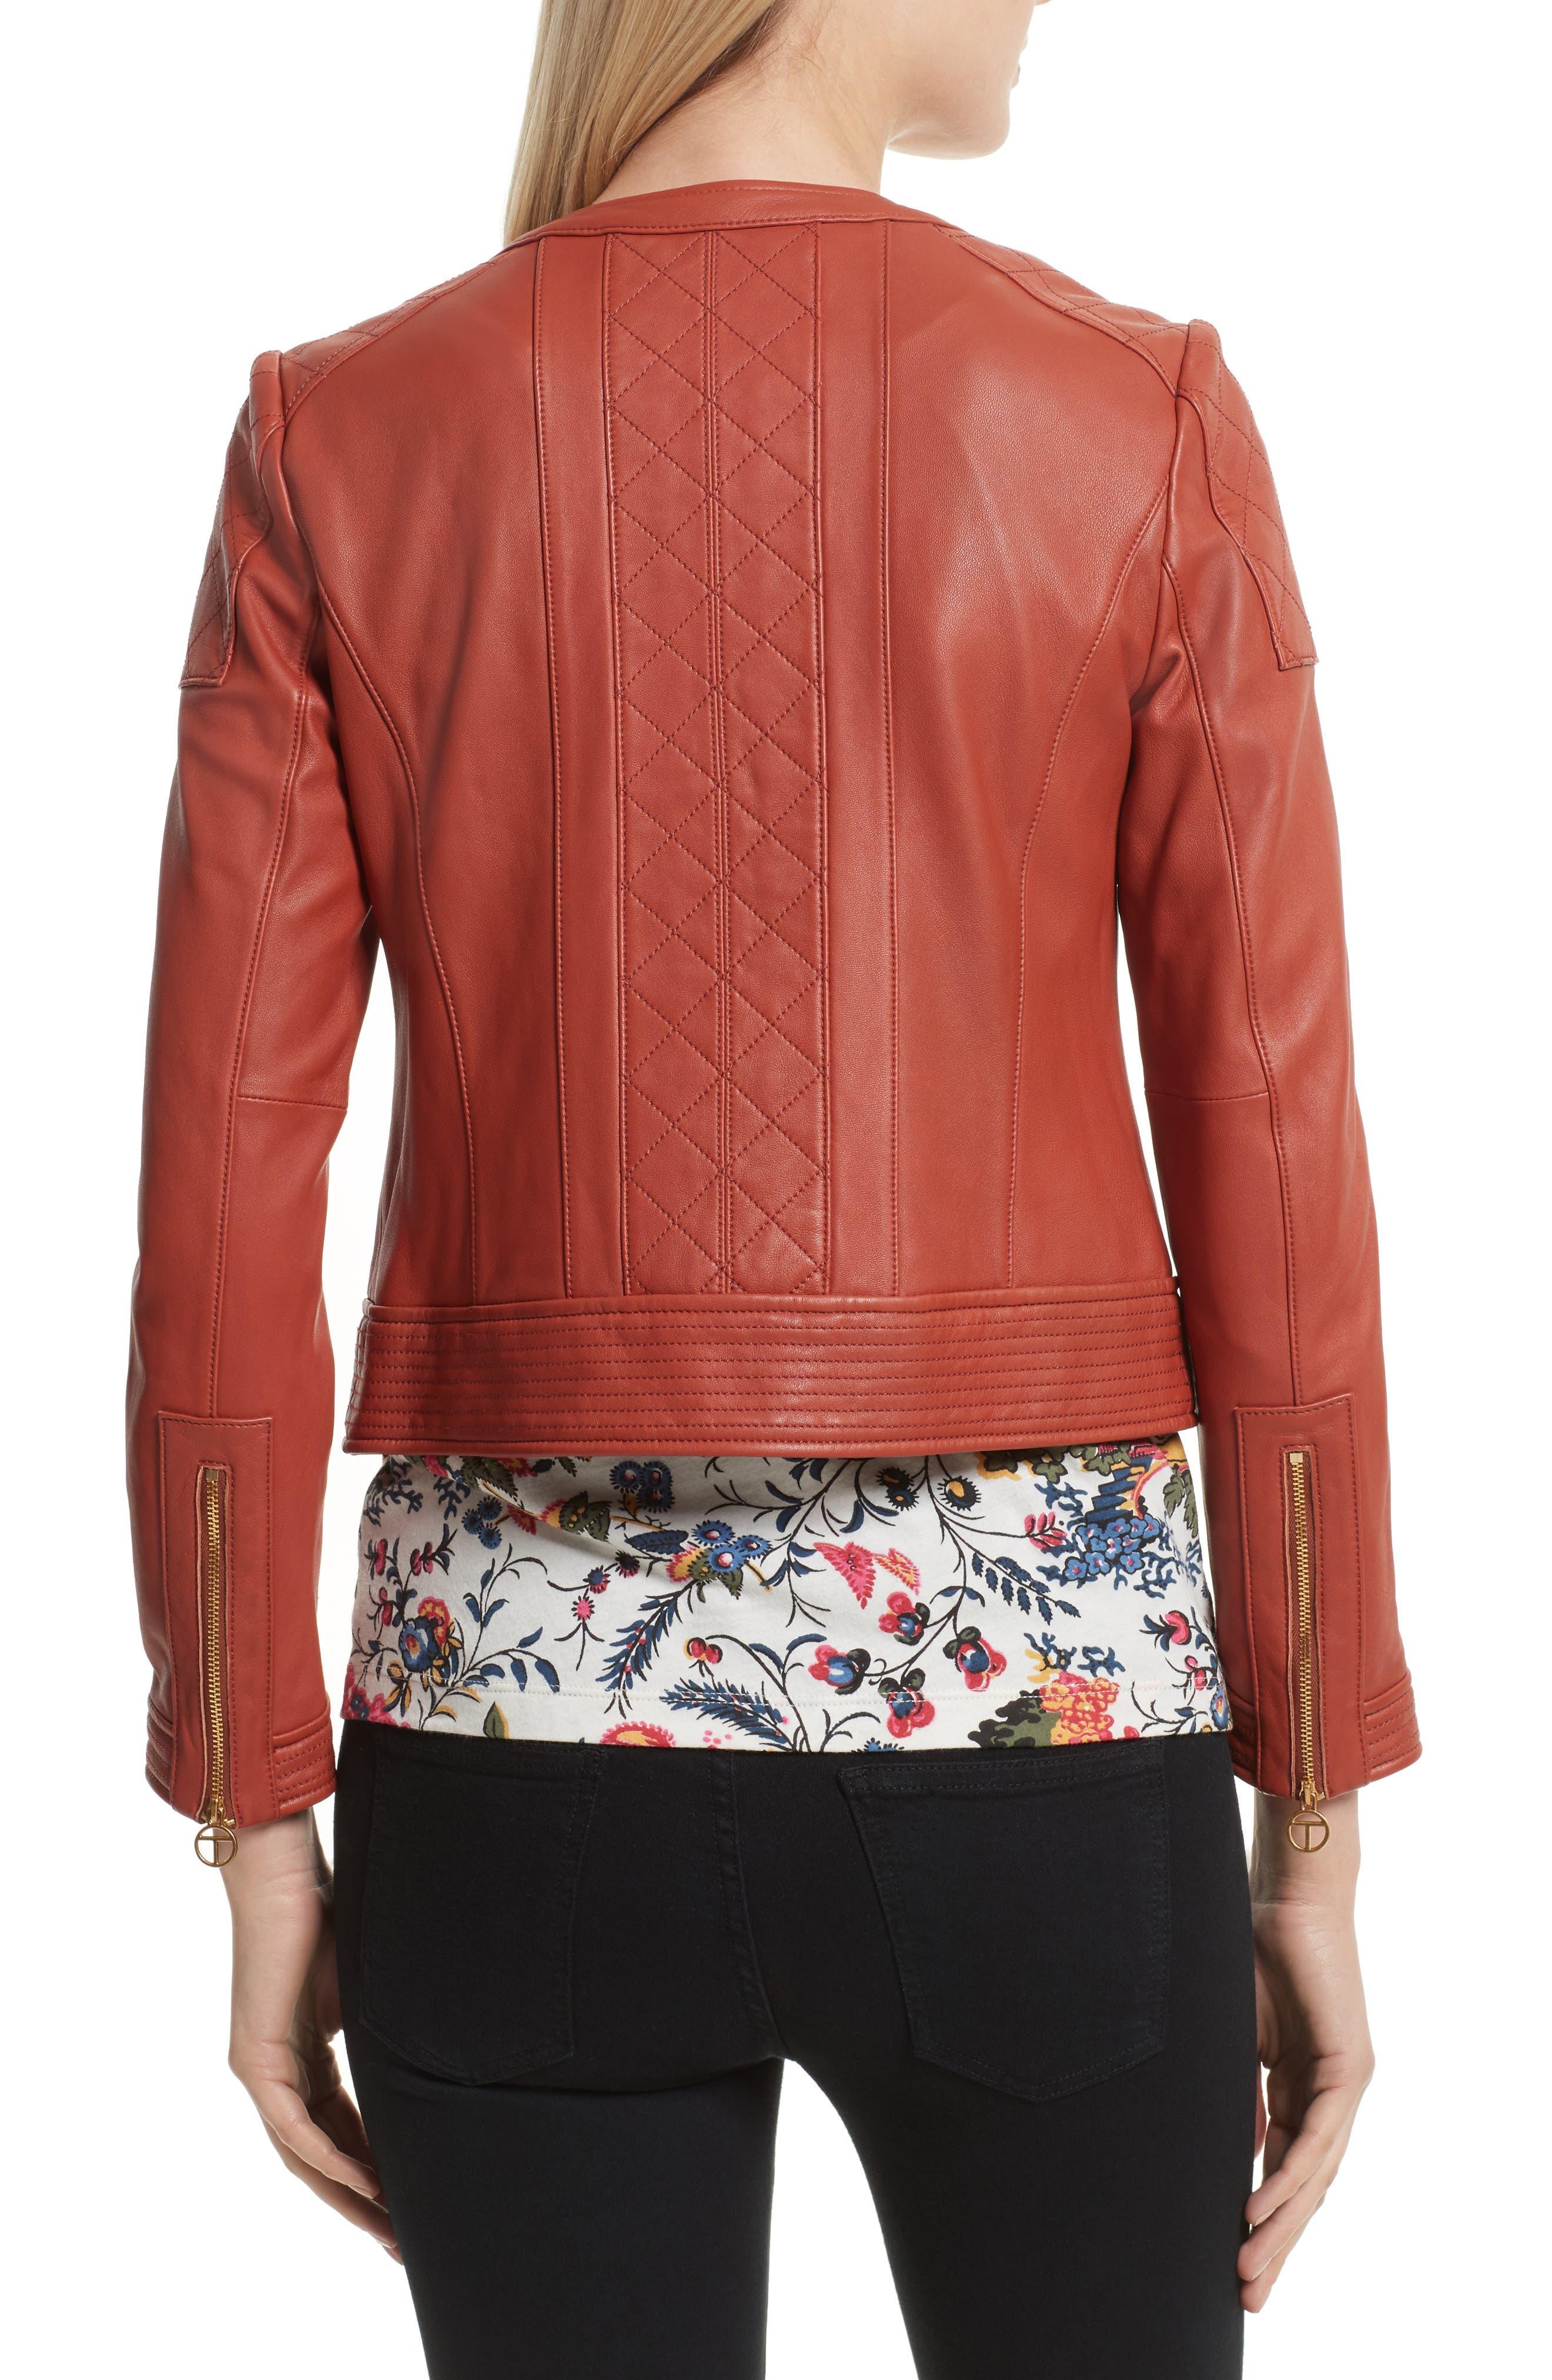 Ryder Leather Jacket,                             Alternate thumbnail 2, color,                             232